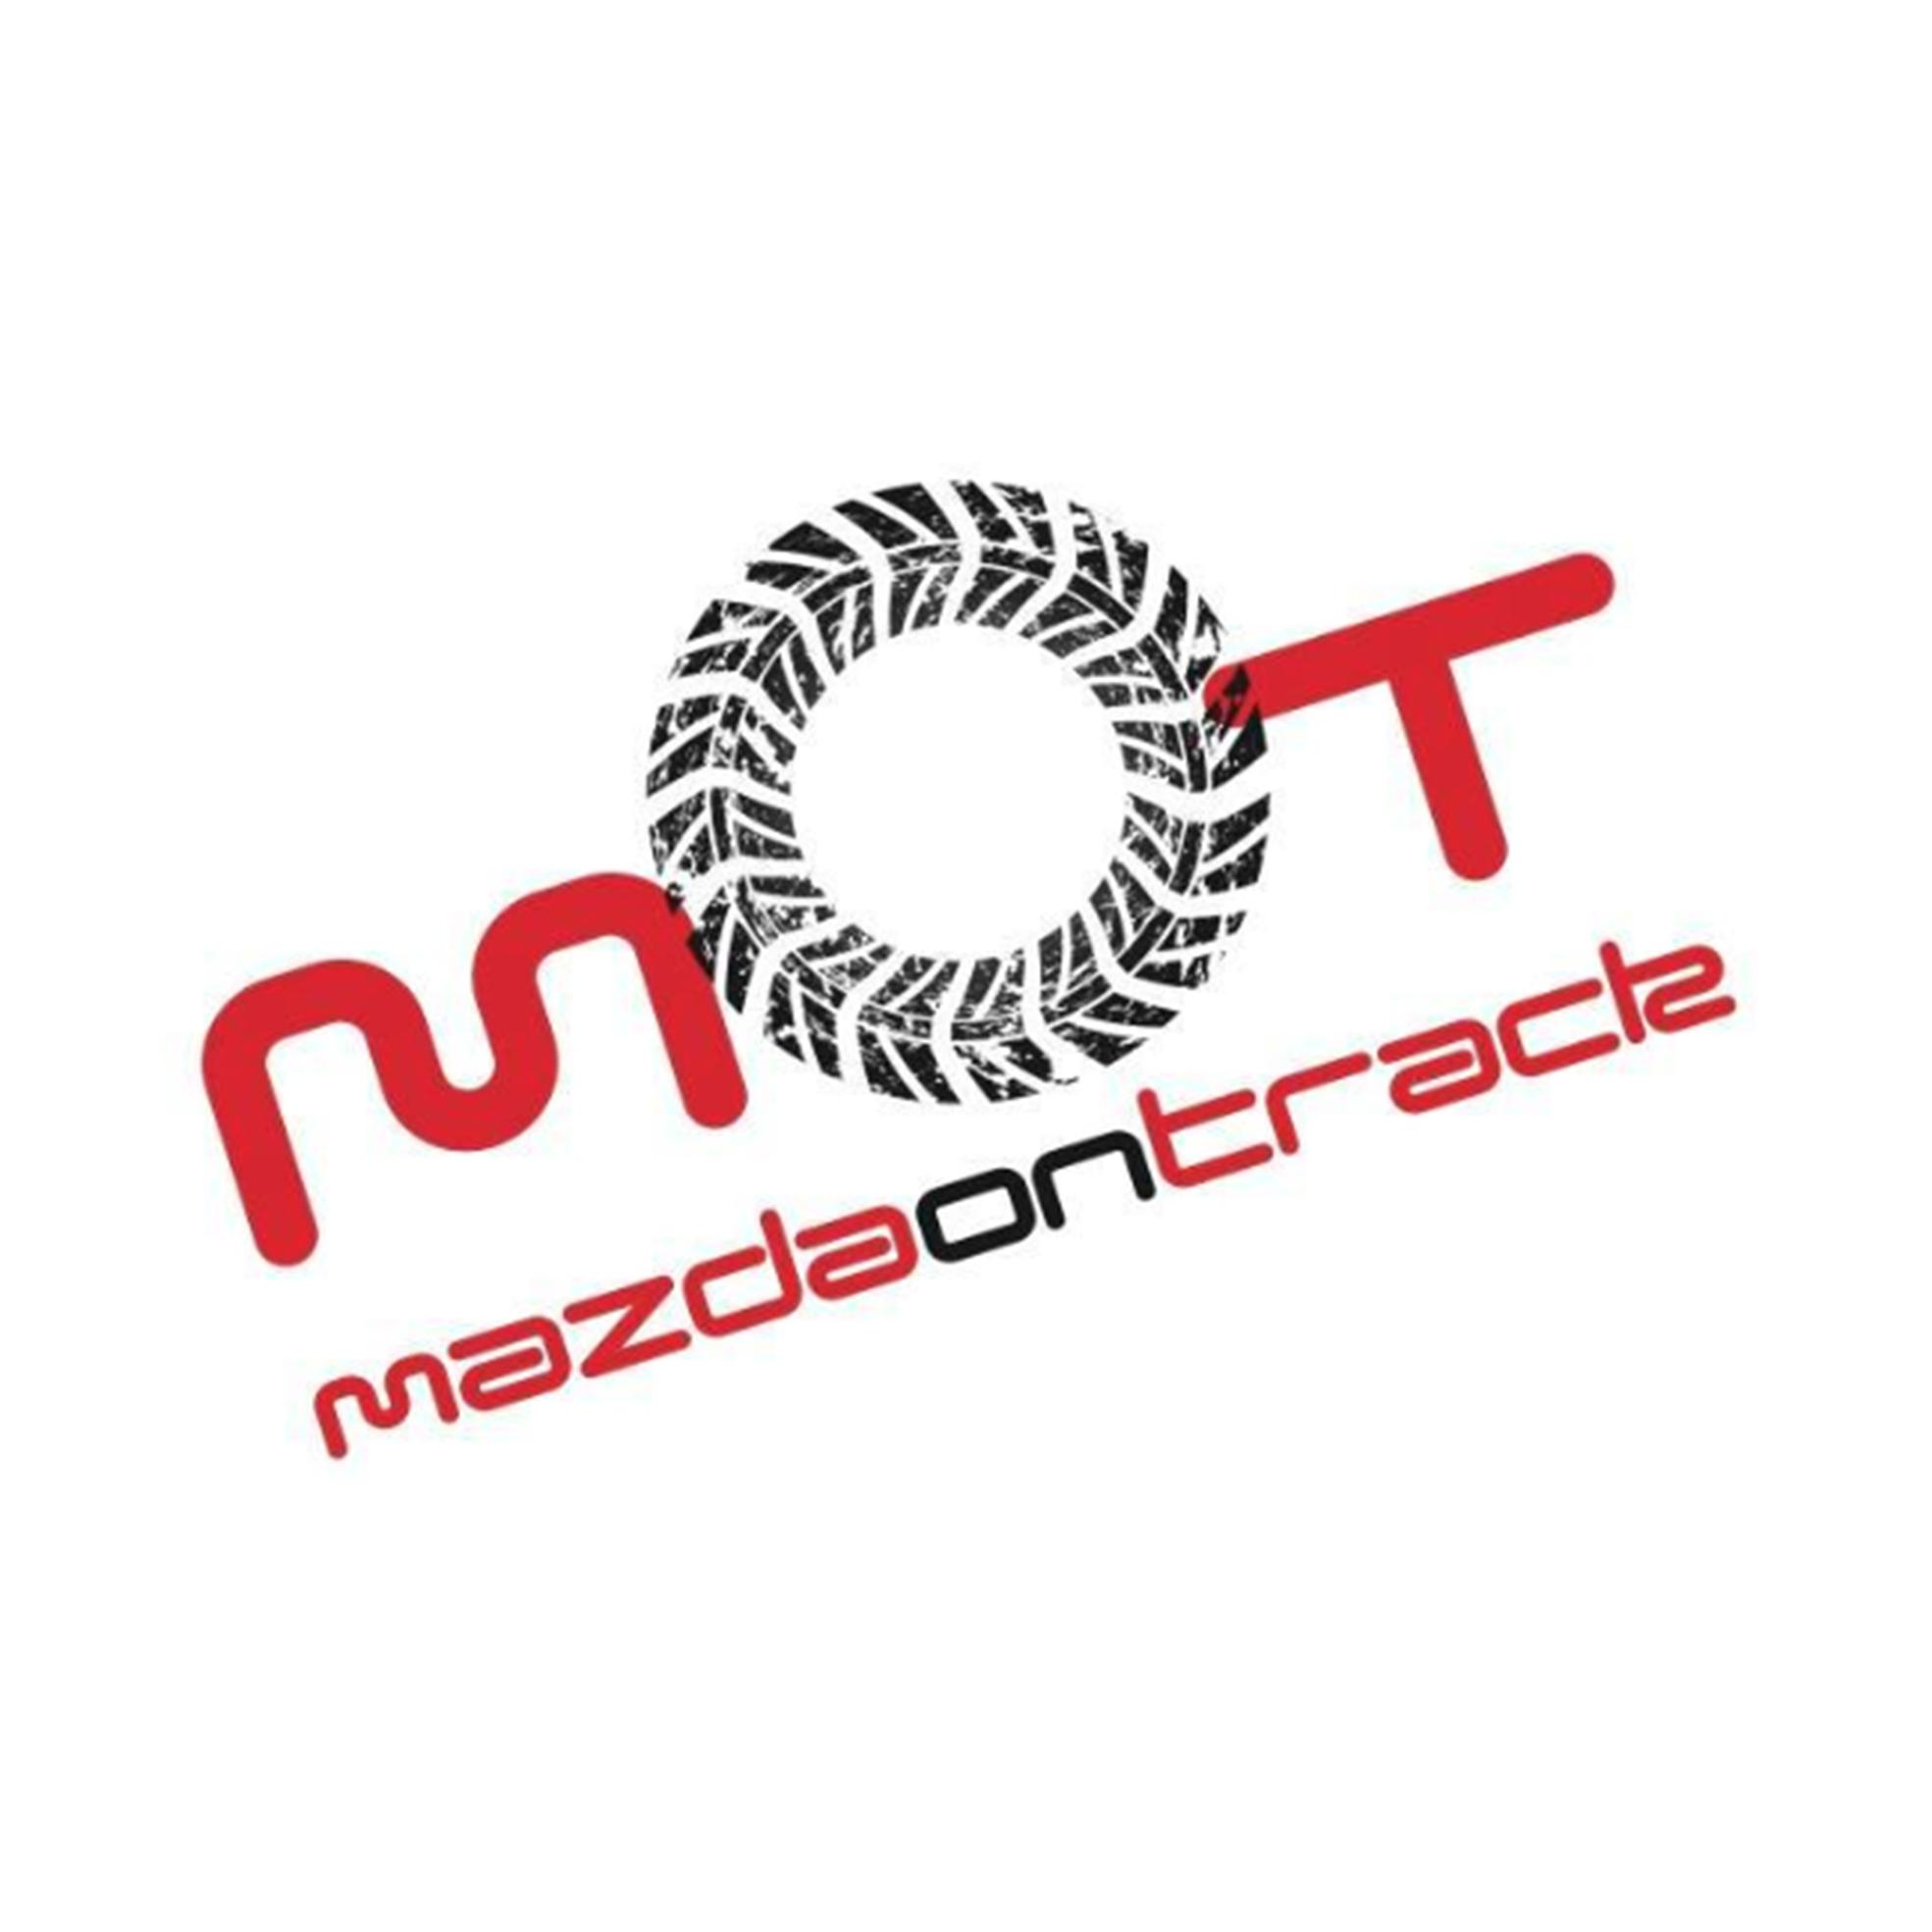 Mazda On Track